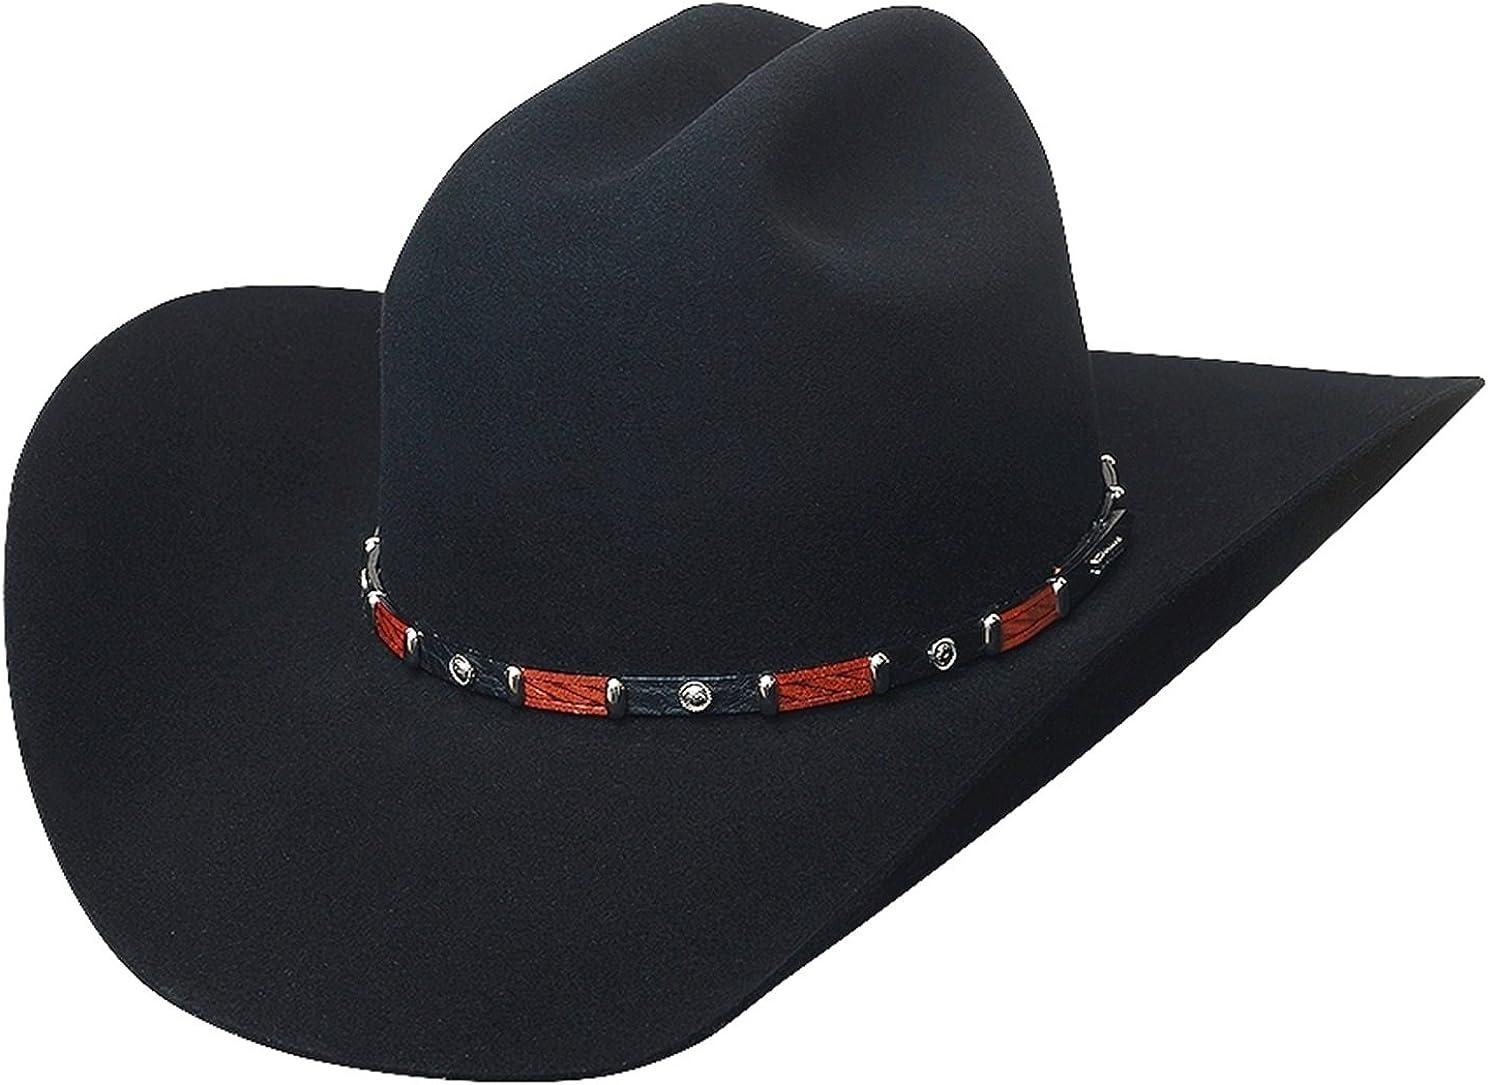 Bullhide Hats 0661Bl Breakaway 10X 7 1/2 Black Cowboy Hat